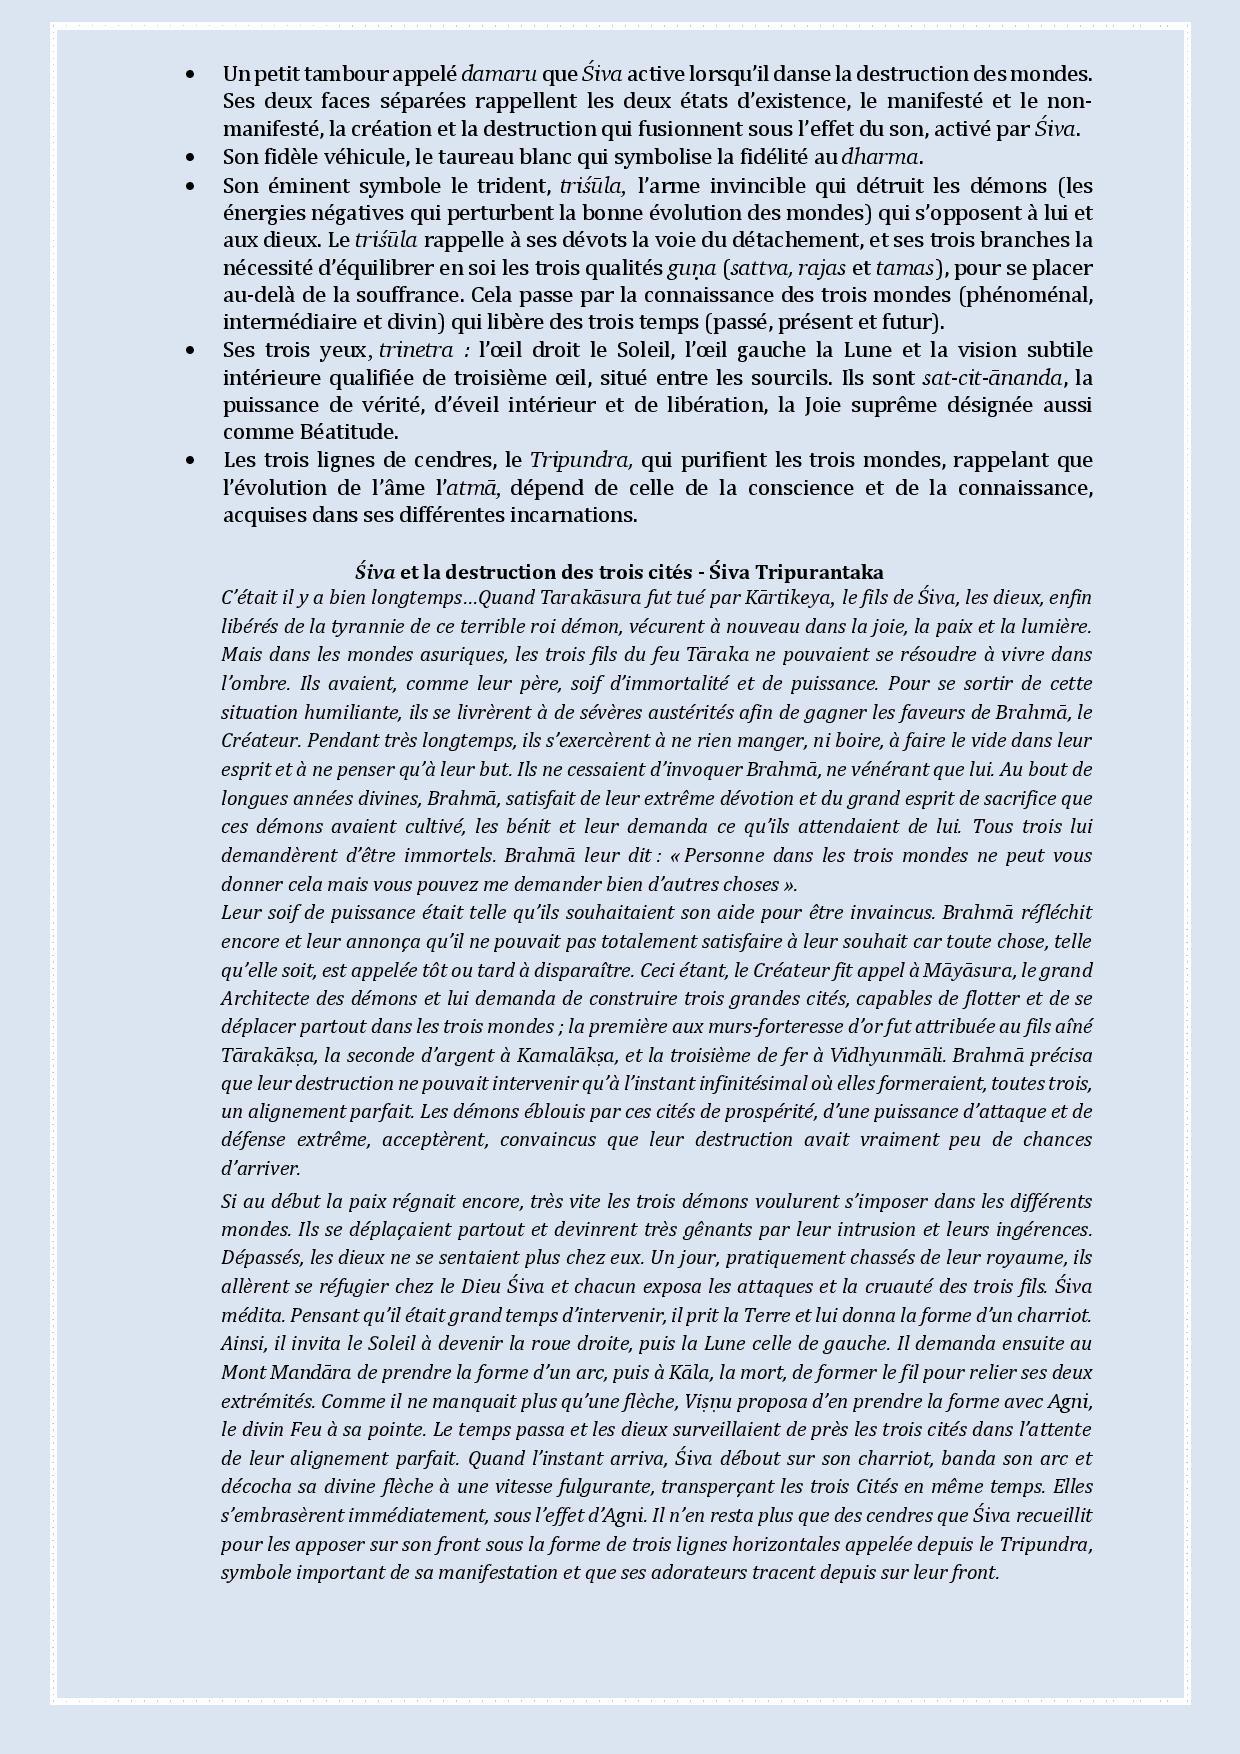 MAHASHIVARATRI 2019 SHIVA 2019-page-003